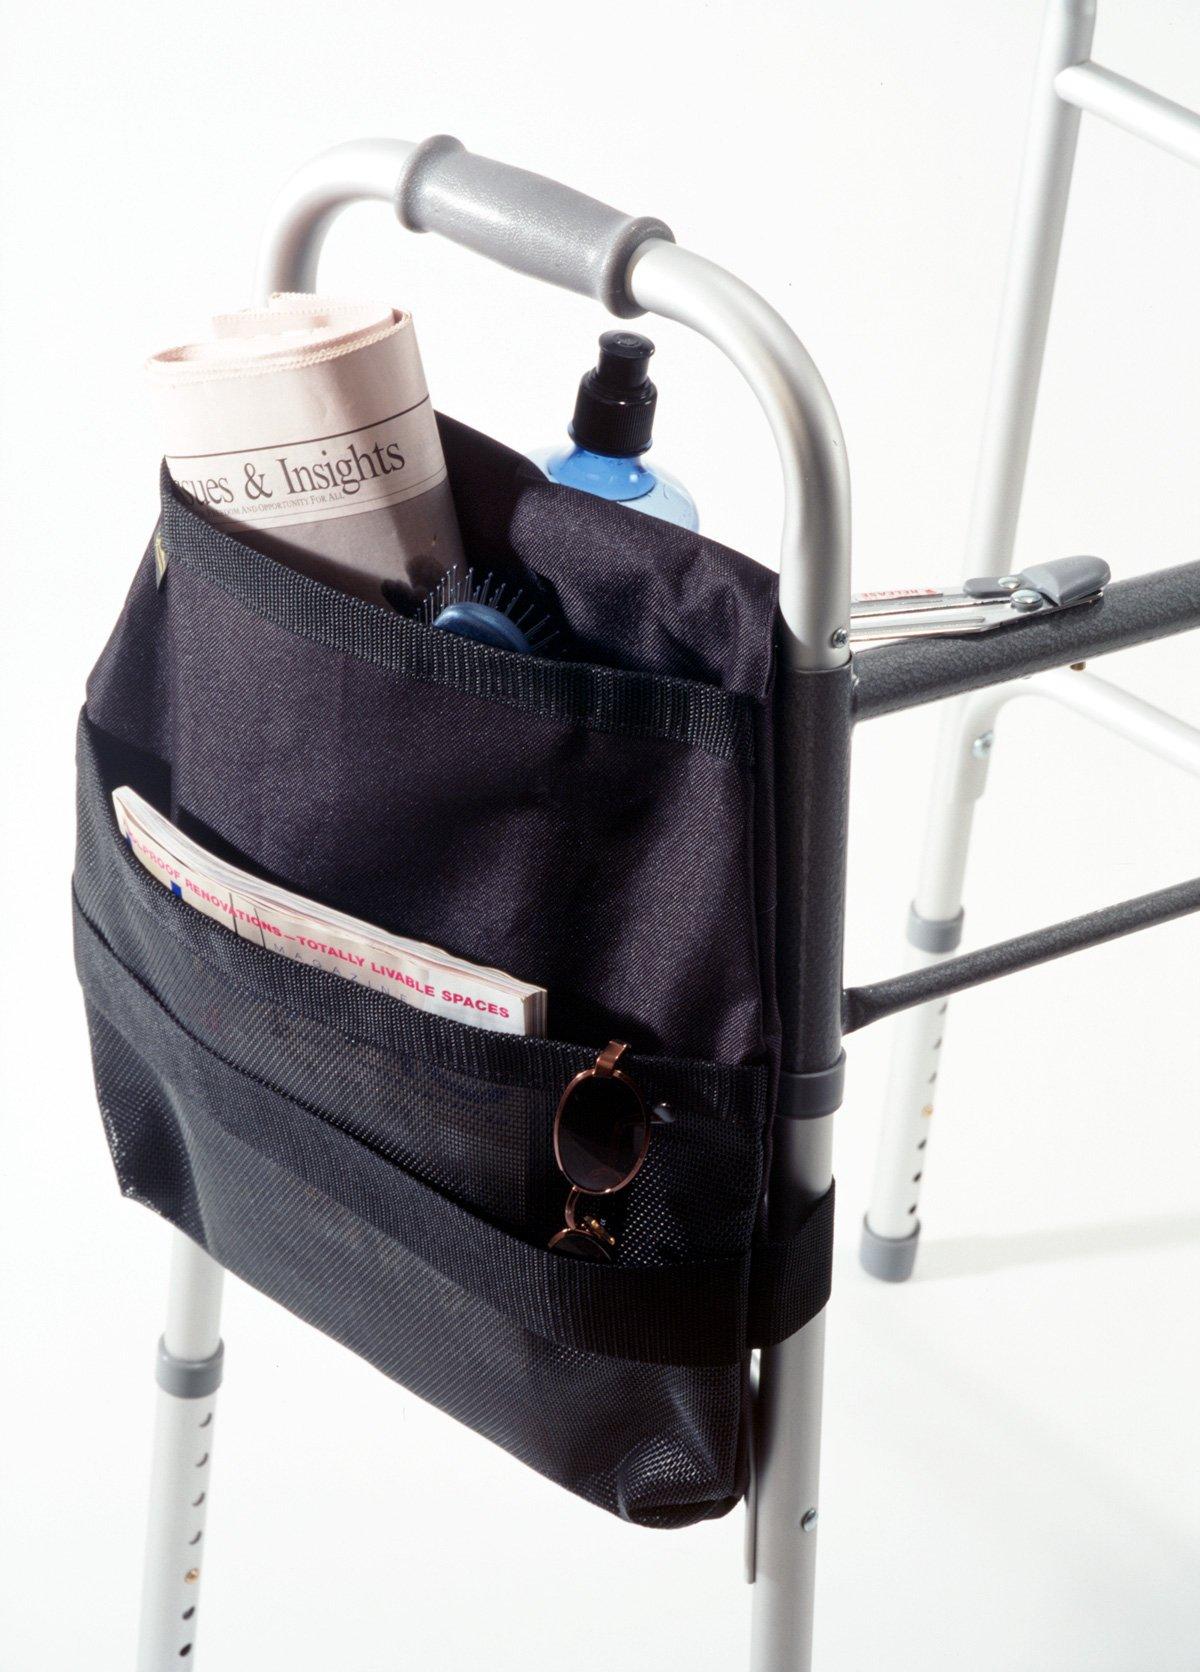 Amazon.com: Yunga Tart Walker Tray: Health & Personal Care